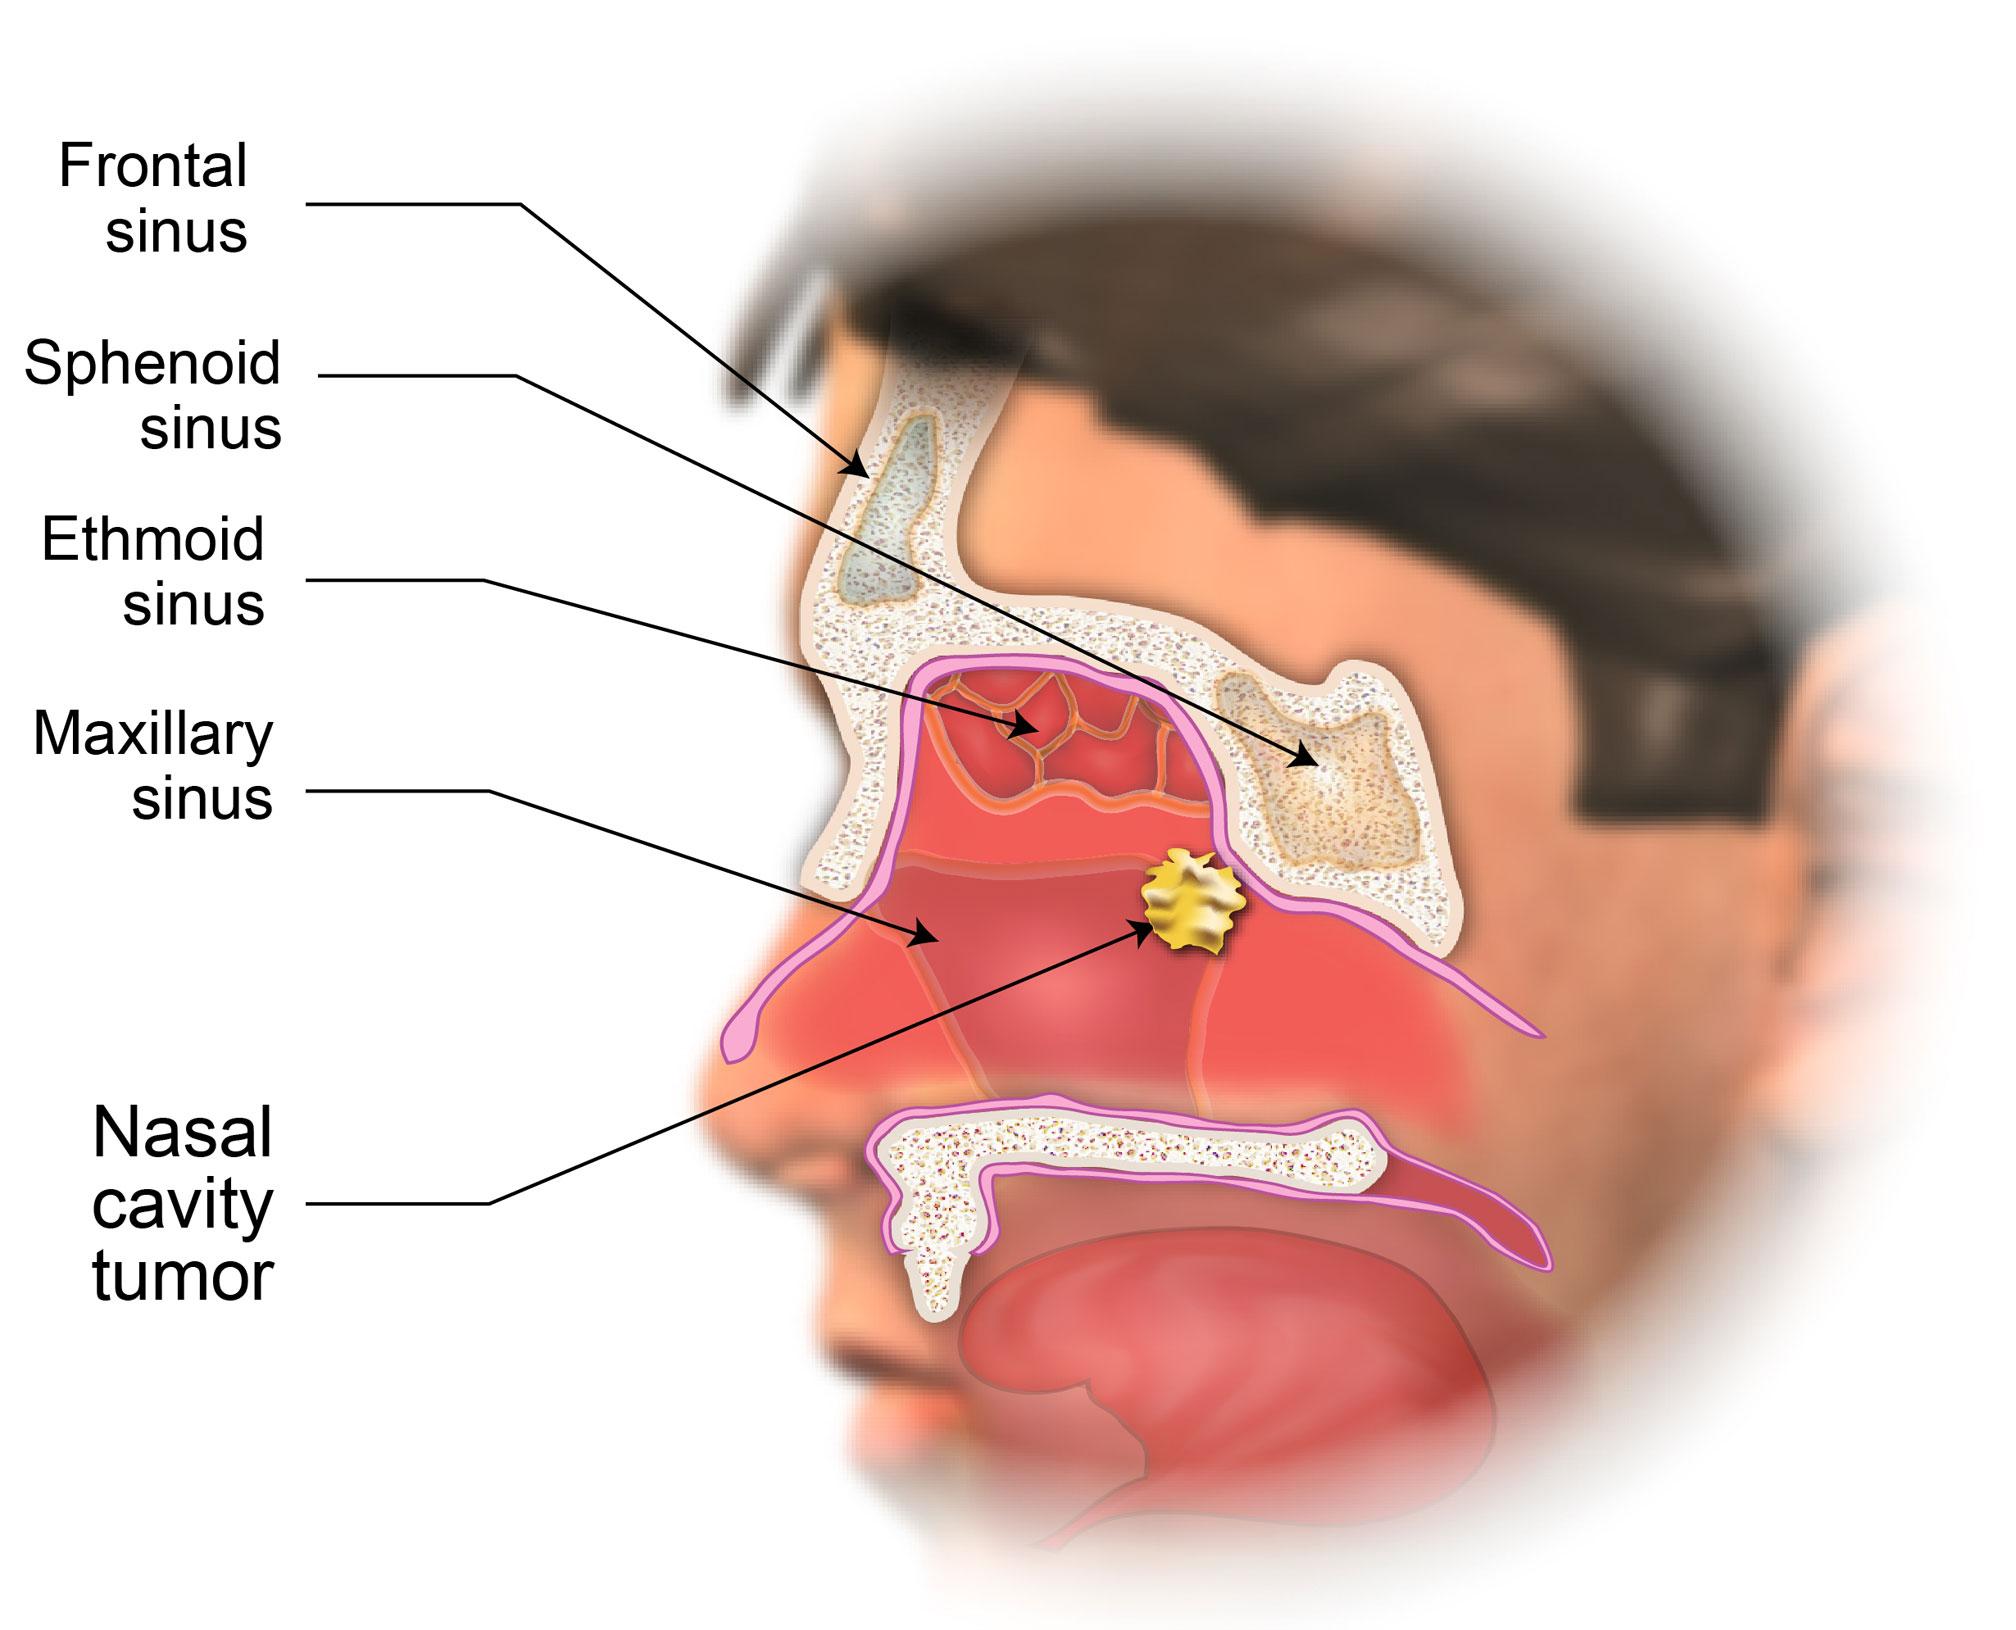 Papilloma nasal pathology